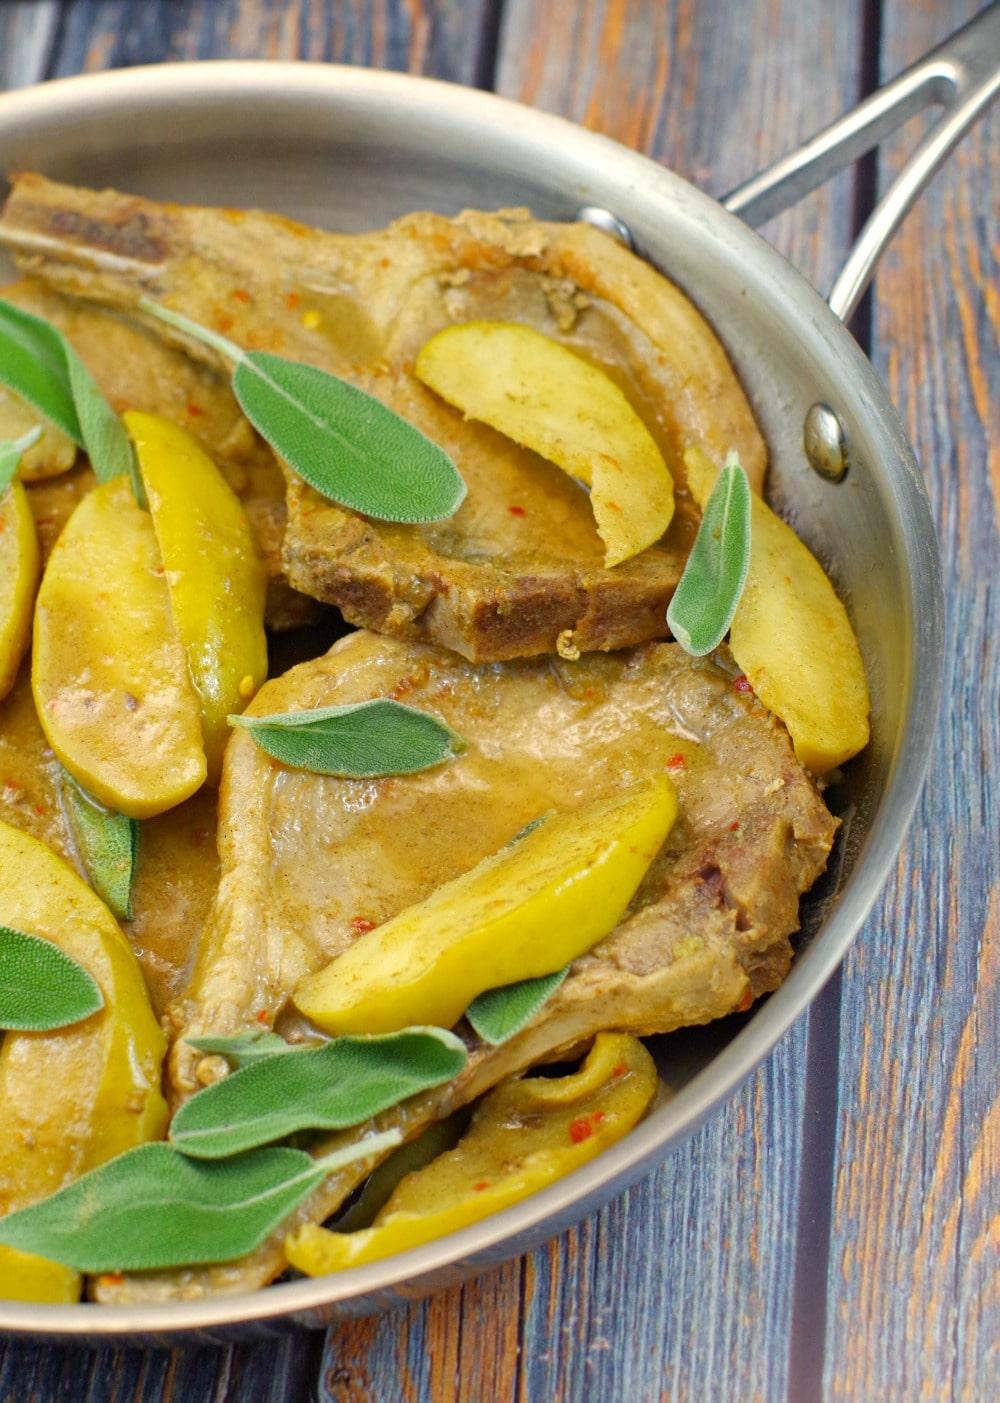 pork-chops-and-apple-sauce-recipe